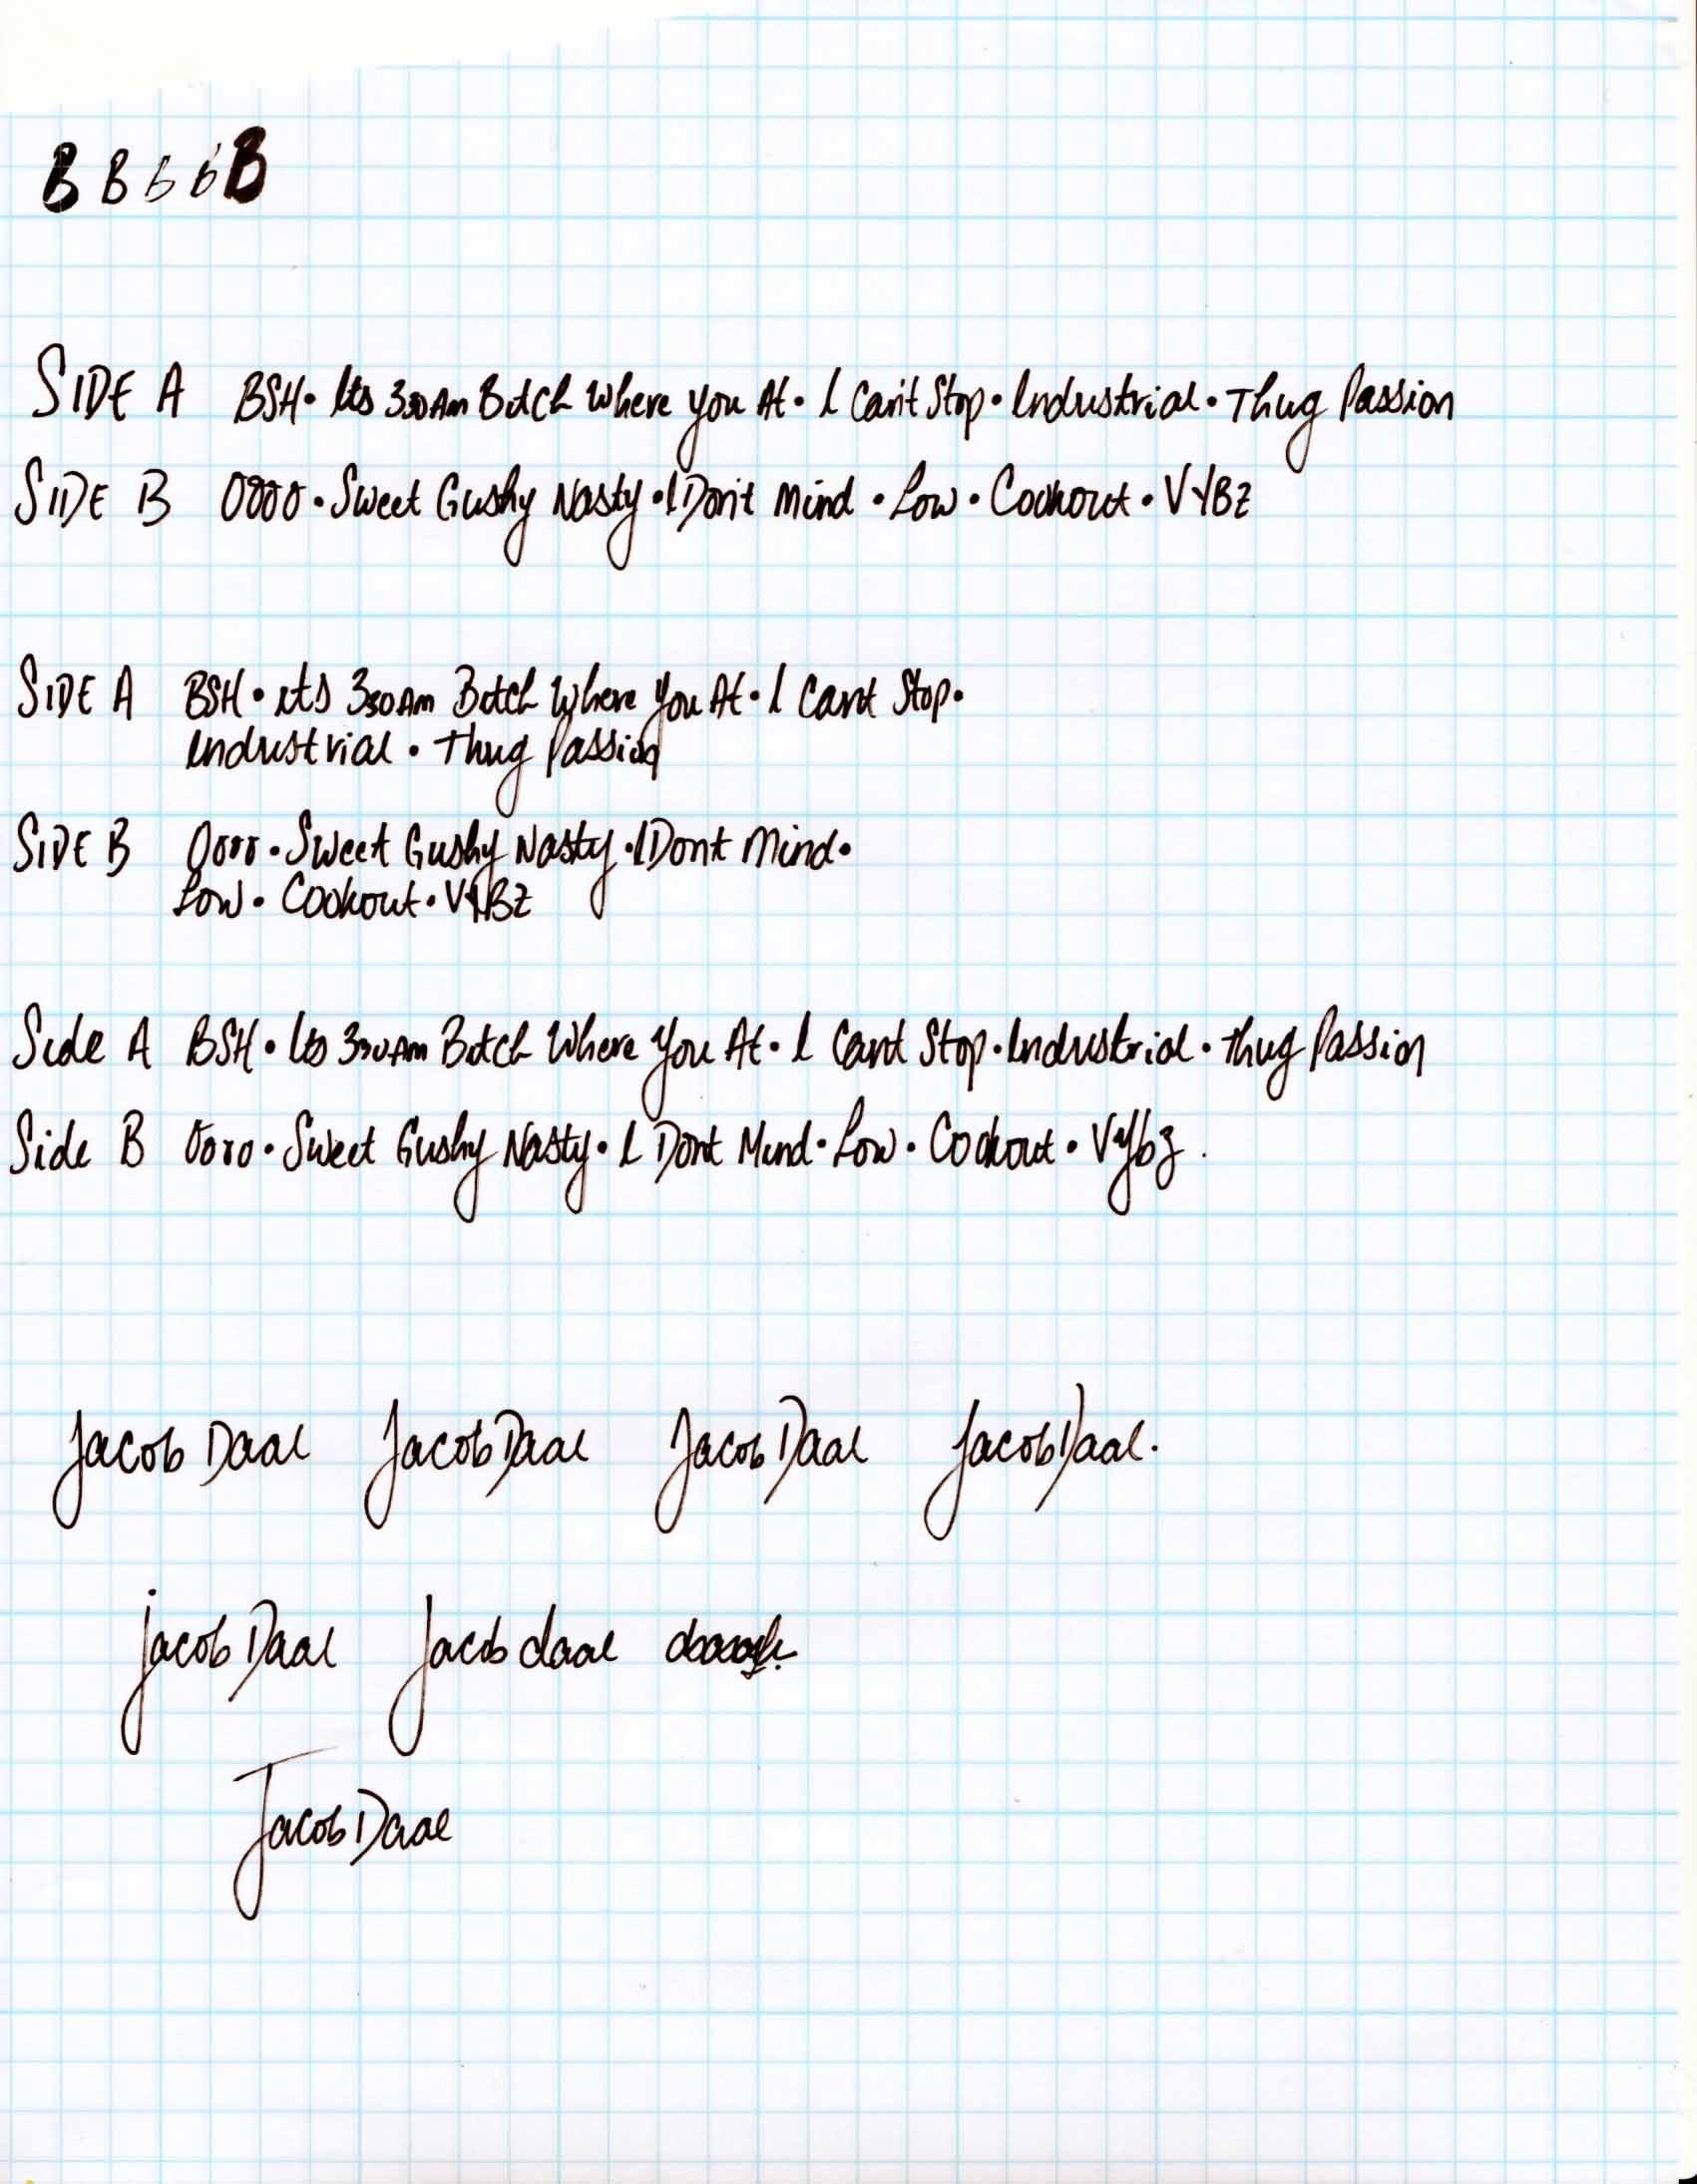 tracklist_sketch_4.jpg